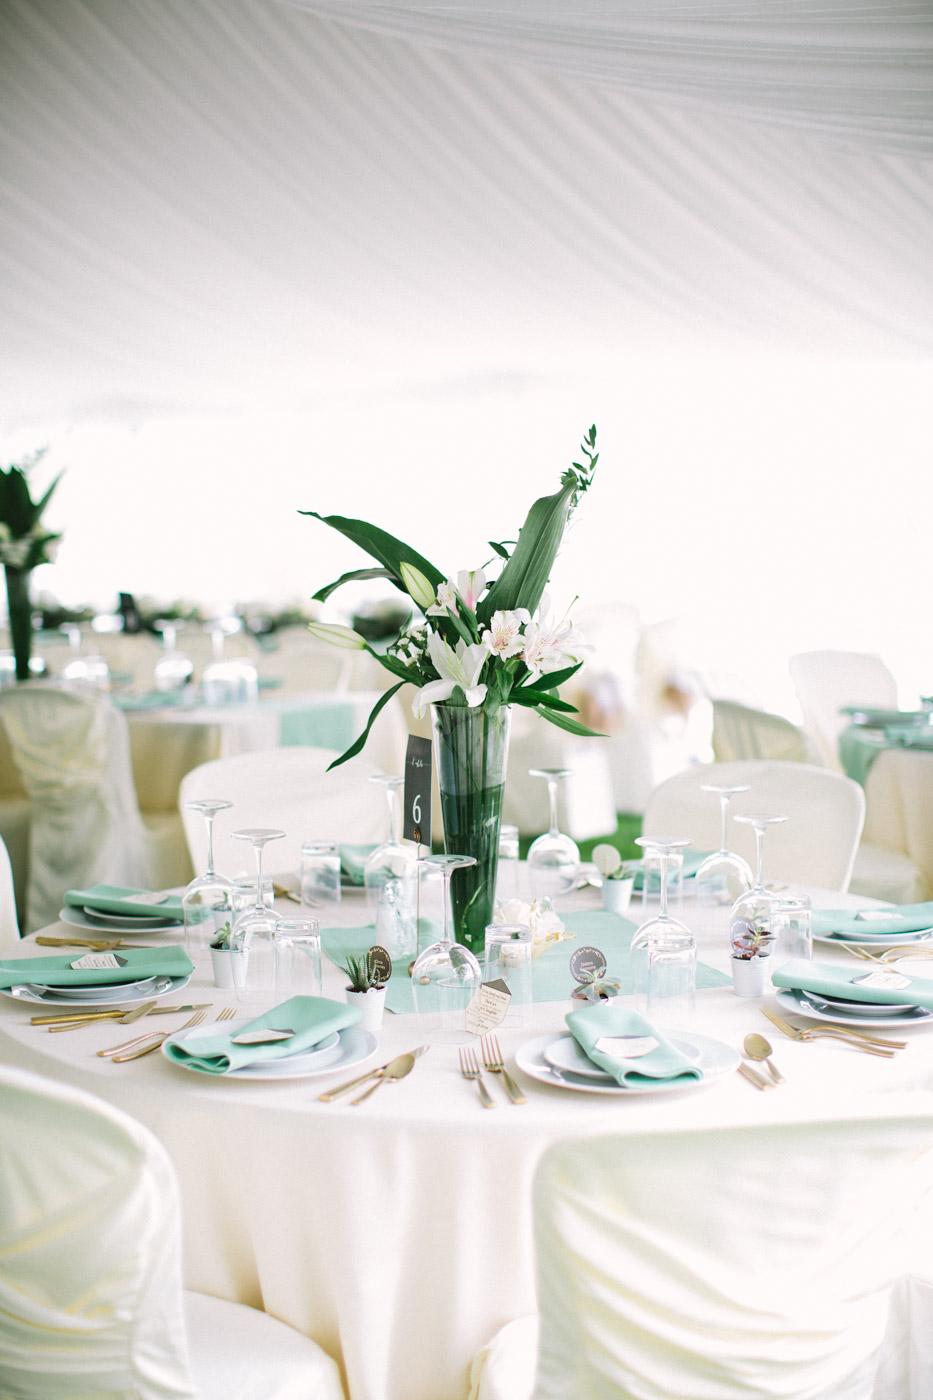 Backyard_collingwood_waterfront_diy_wedding-30.jpg